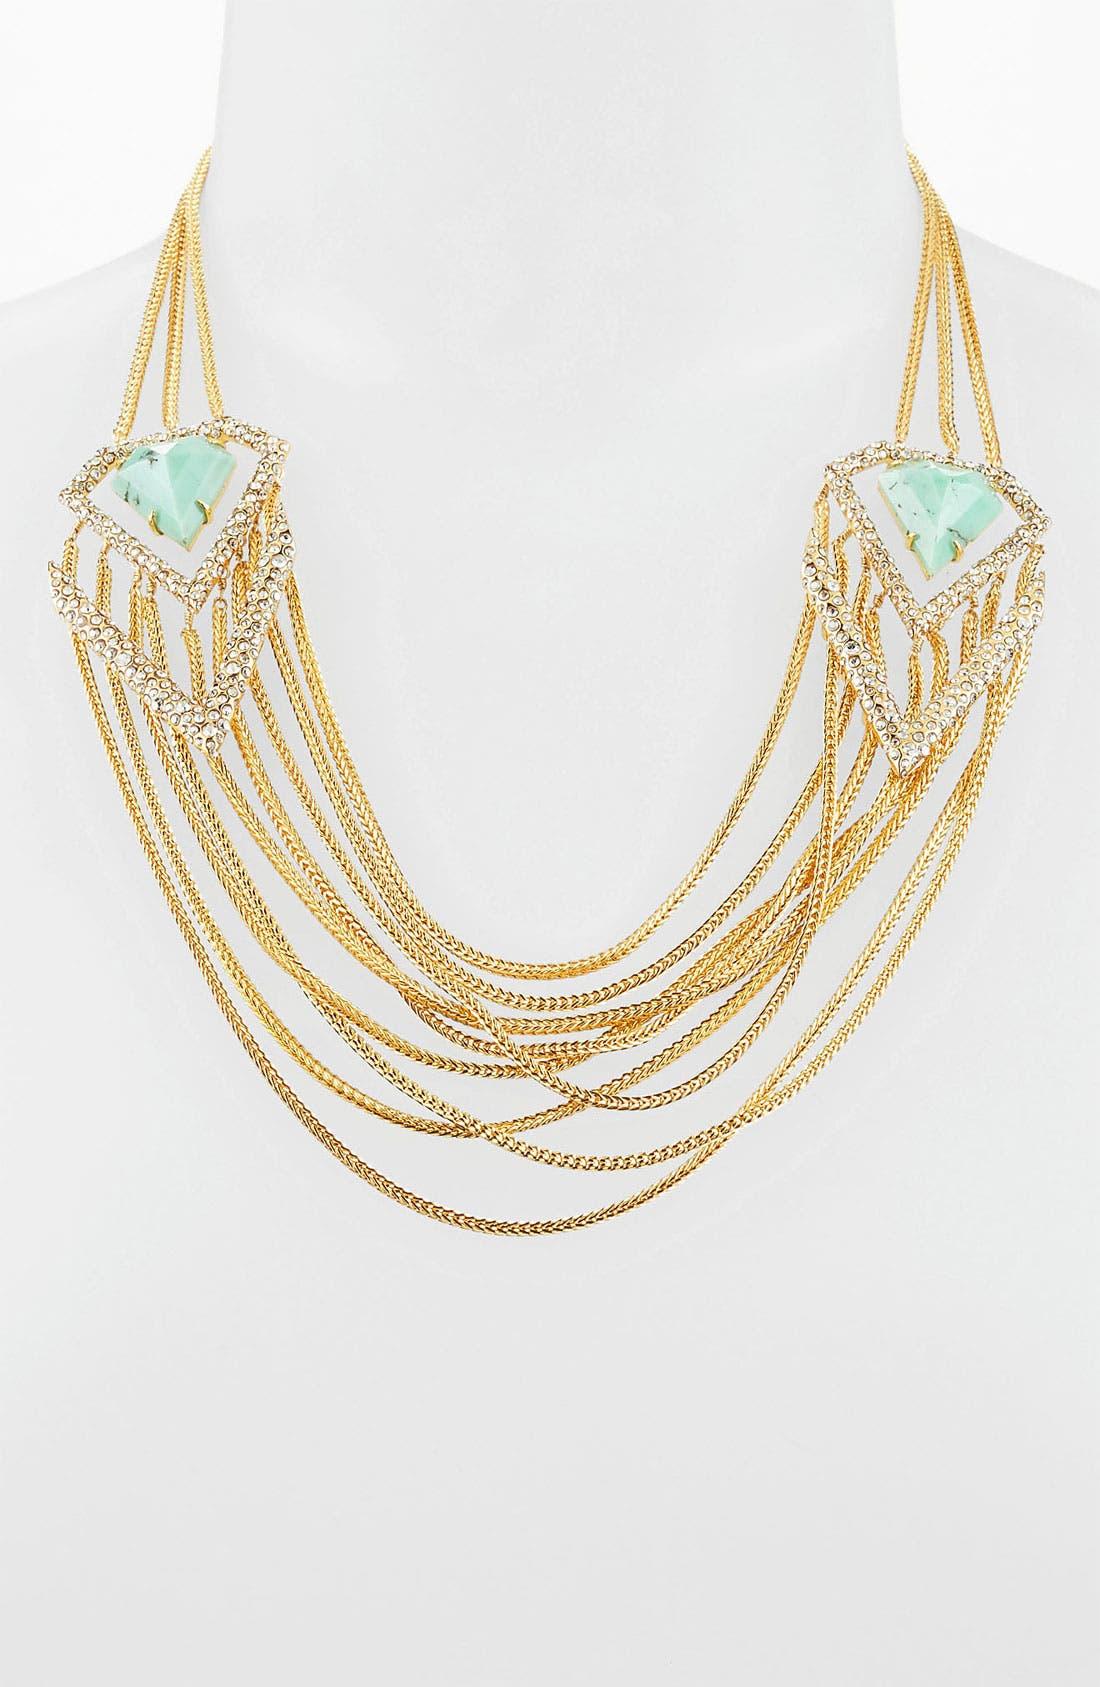 Alternate Image 1 Selected - Alexis Bittar 'Miss Havisham - New Wave' Multistrand Necklace